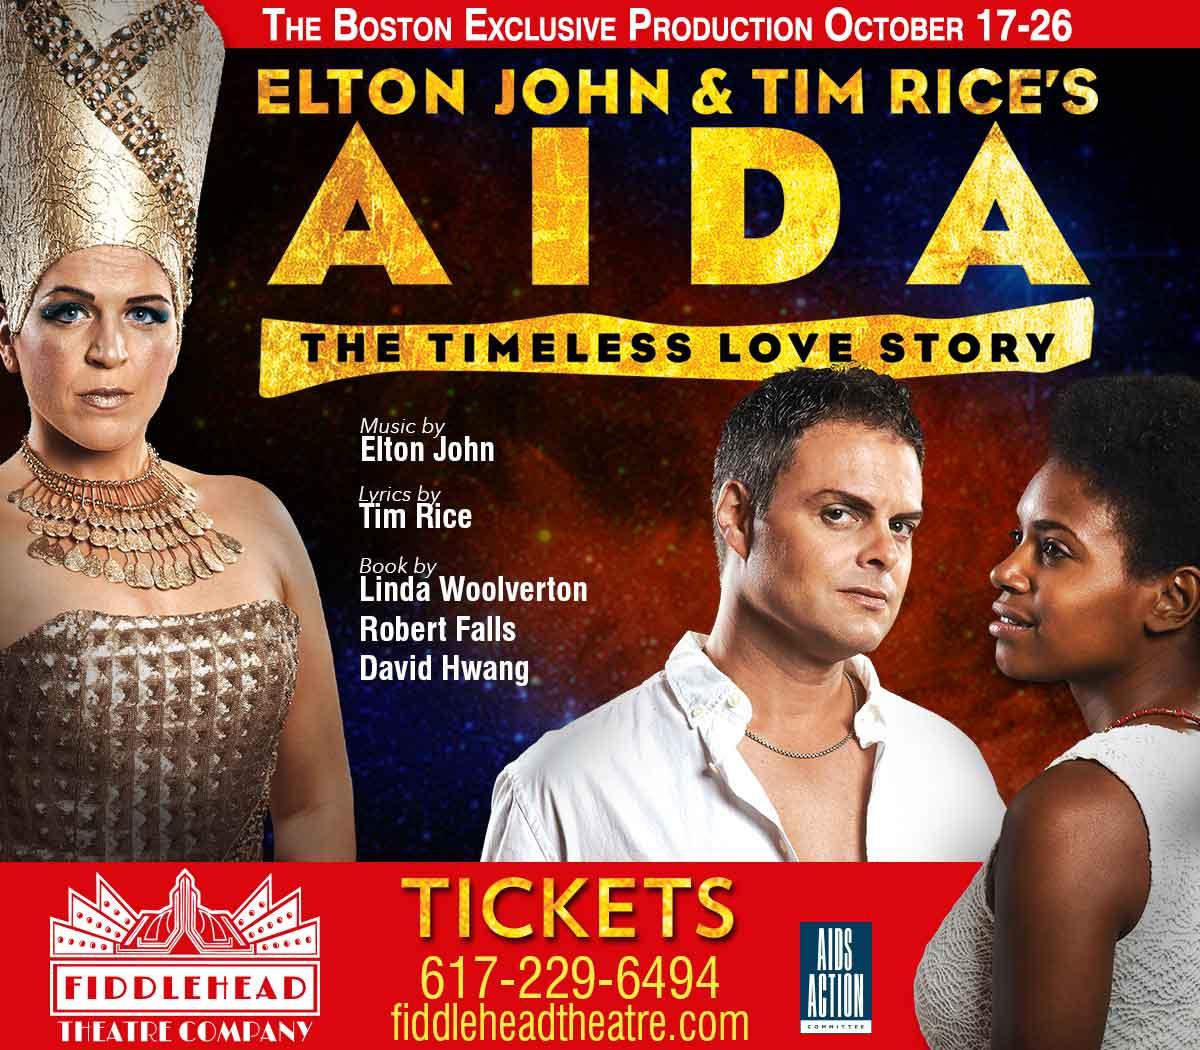 AIDA-Arts-Boston-Poster